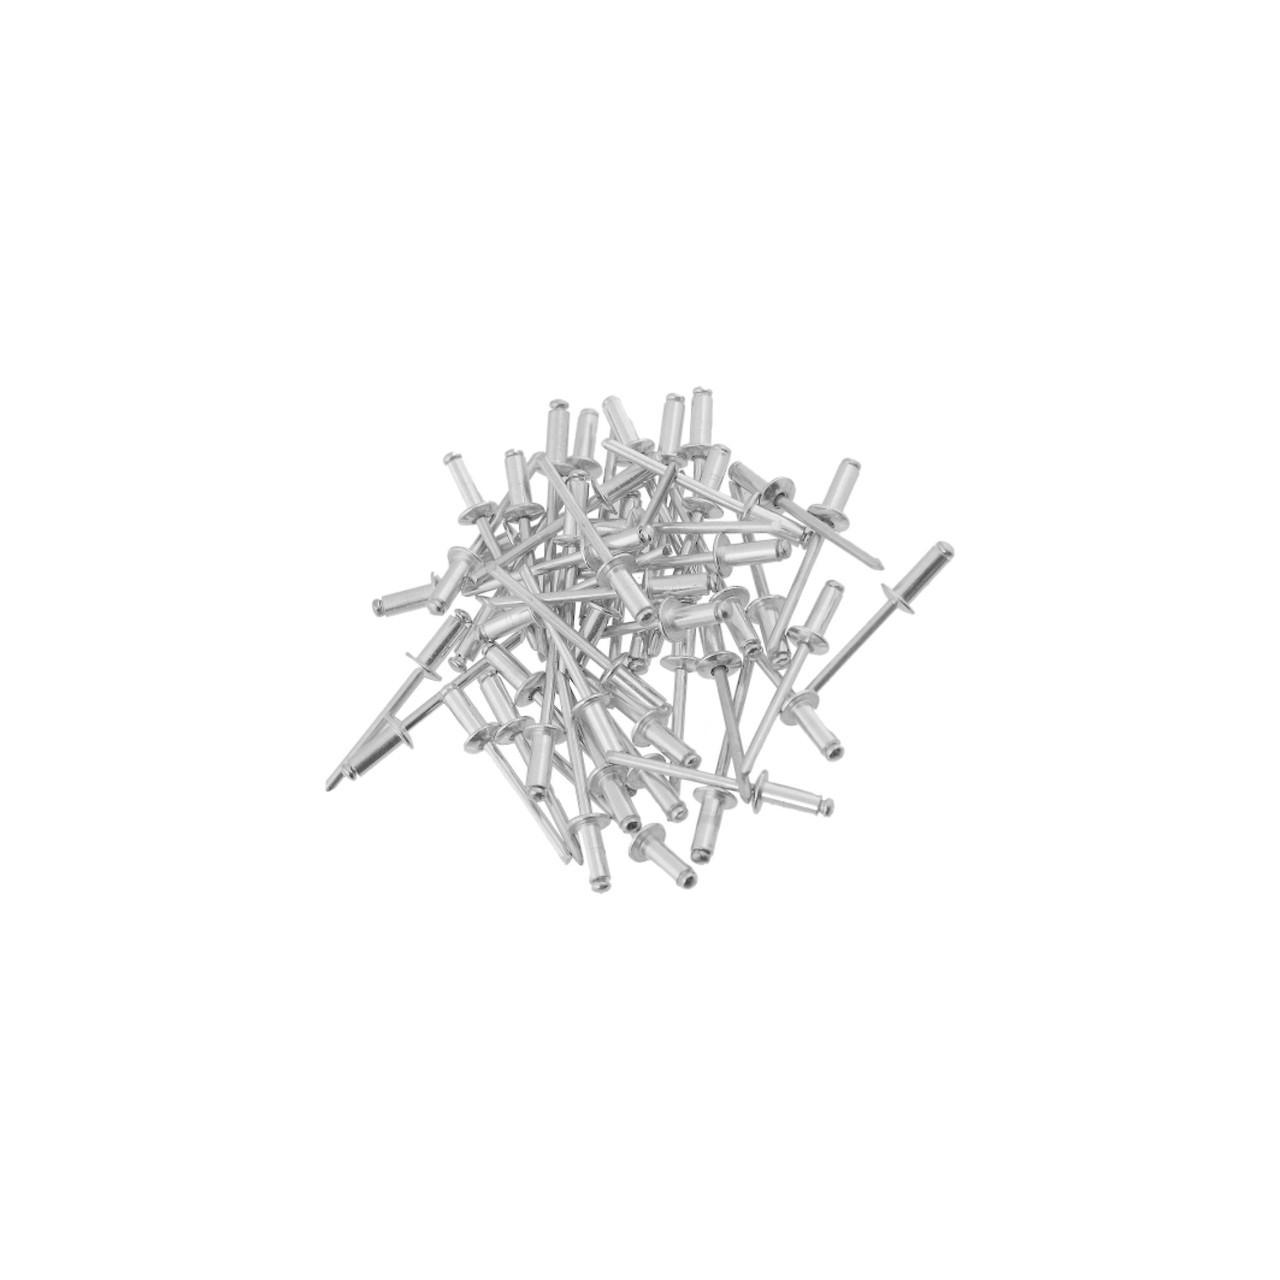 Заклепки 4,0х16 мм, 50 шт FASTER TOOLS